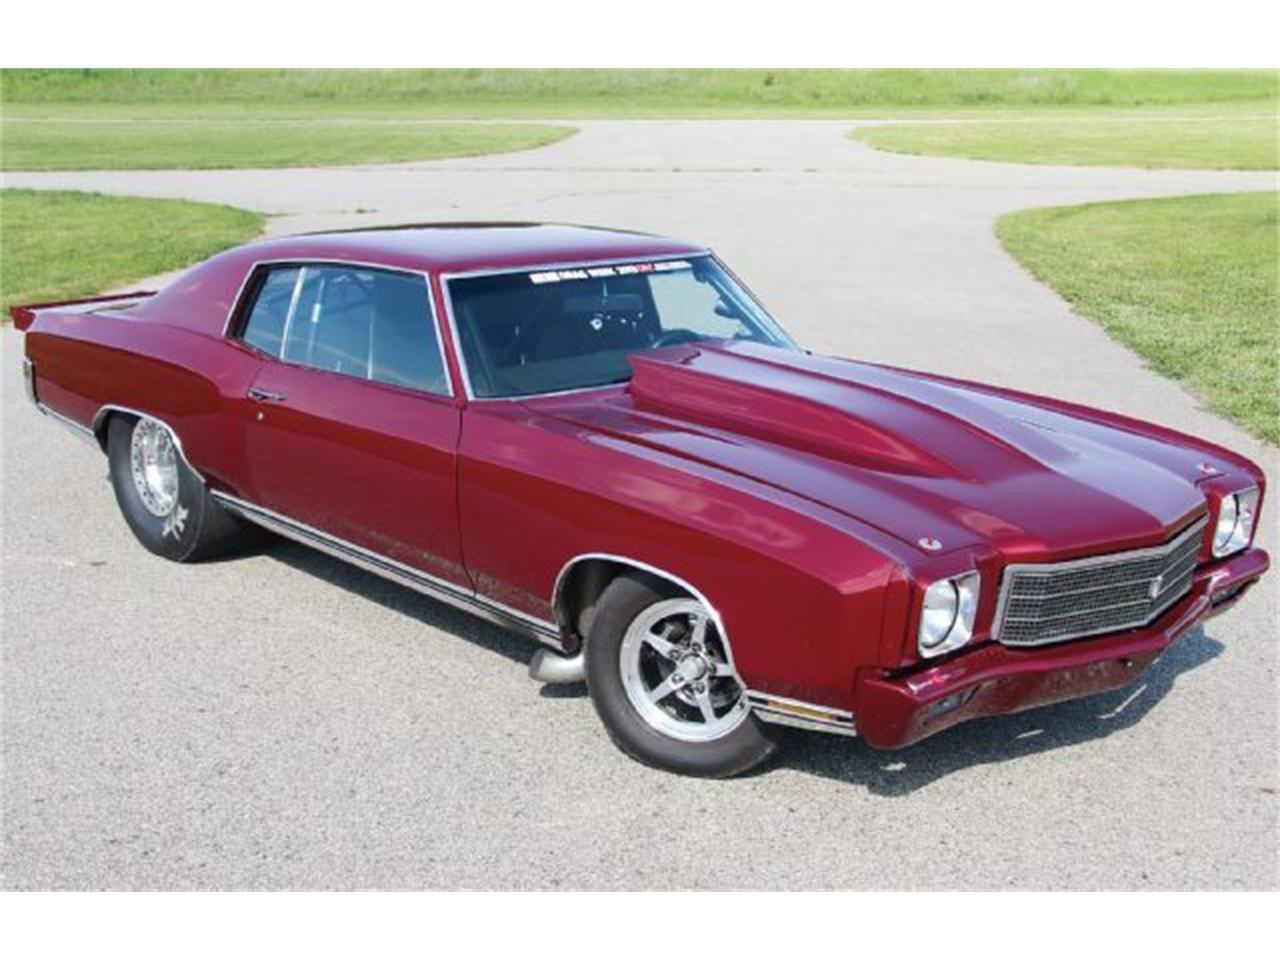 1971 Chevrolet Monte Carlo For Sale Classiccars Com Cc 1192852